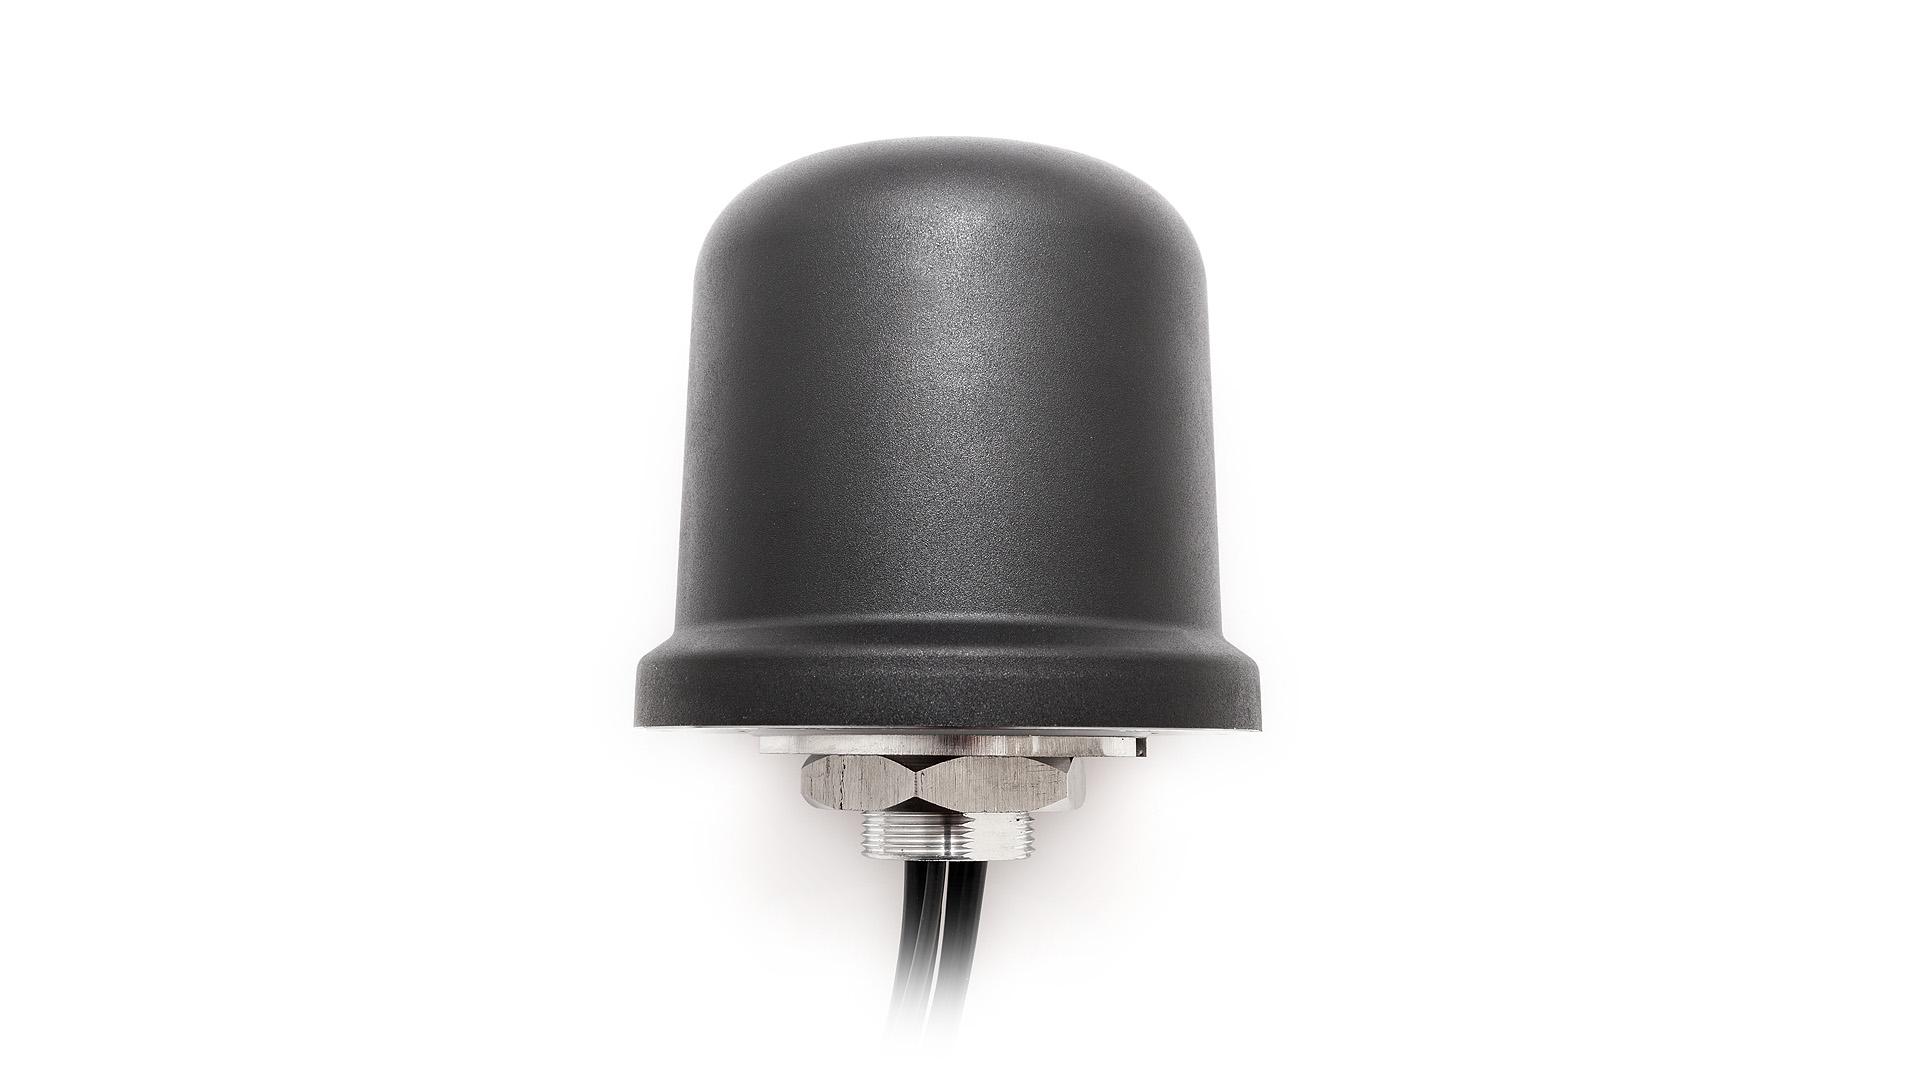 2j7050bga Antenna Power Saver Circuit